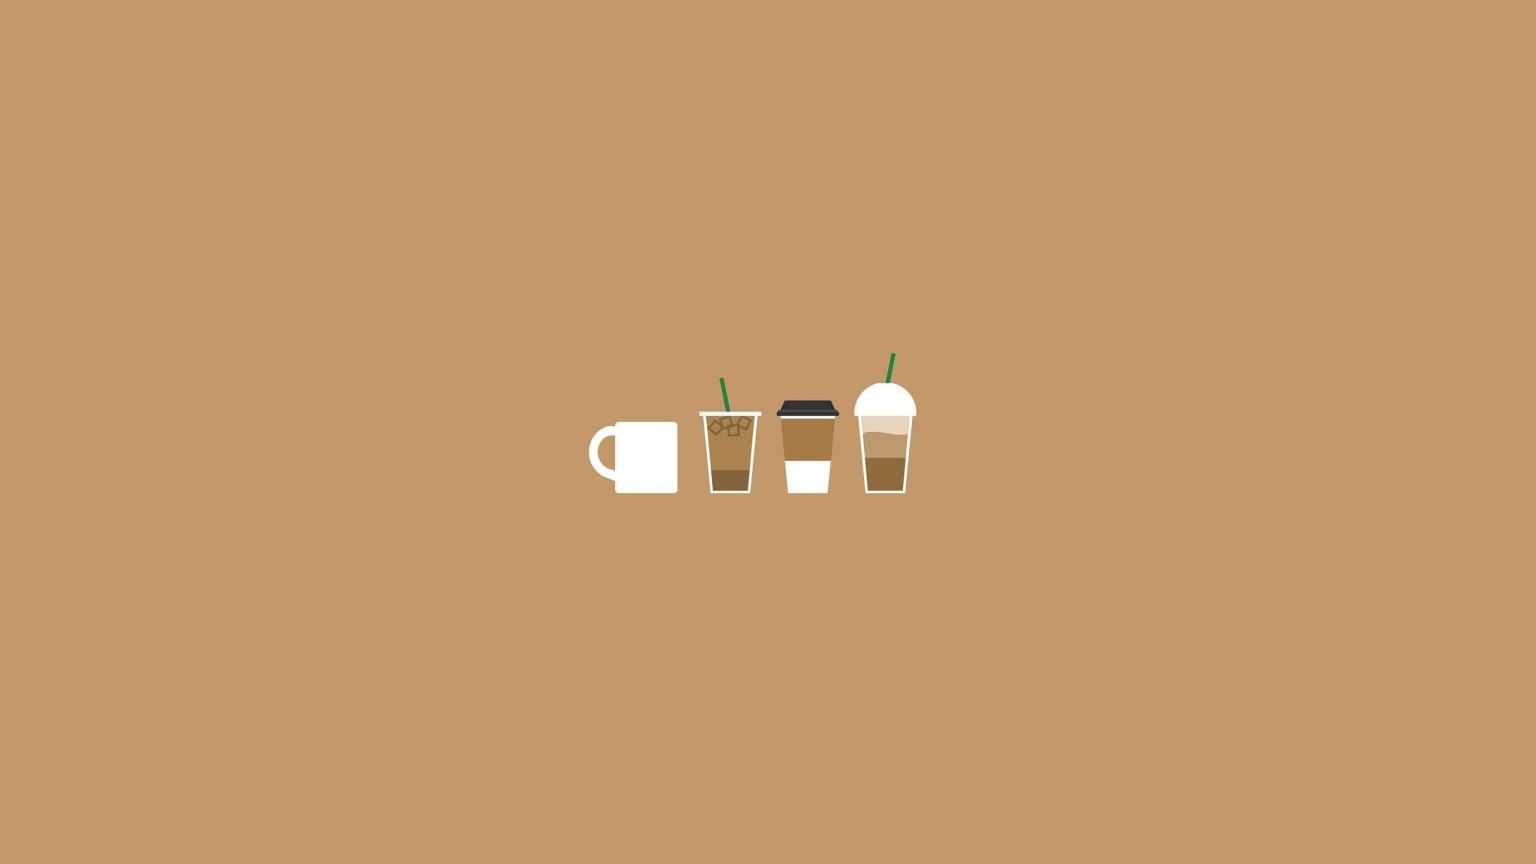 Free download Coffee Illustration Aesthetic desktop ...